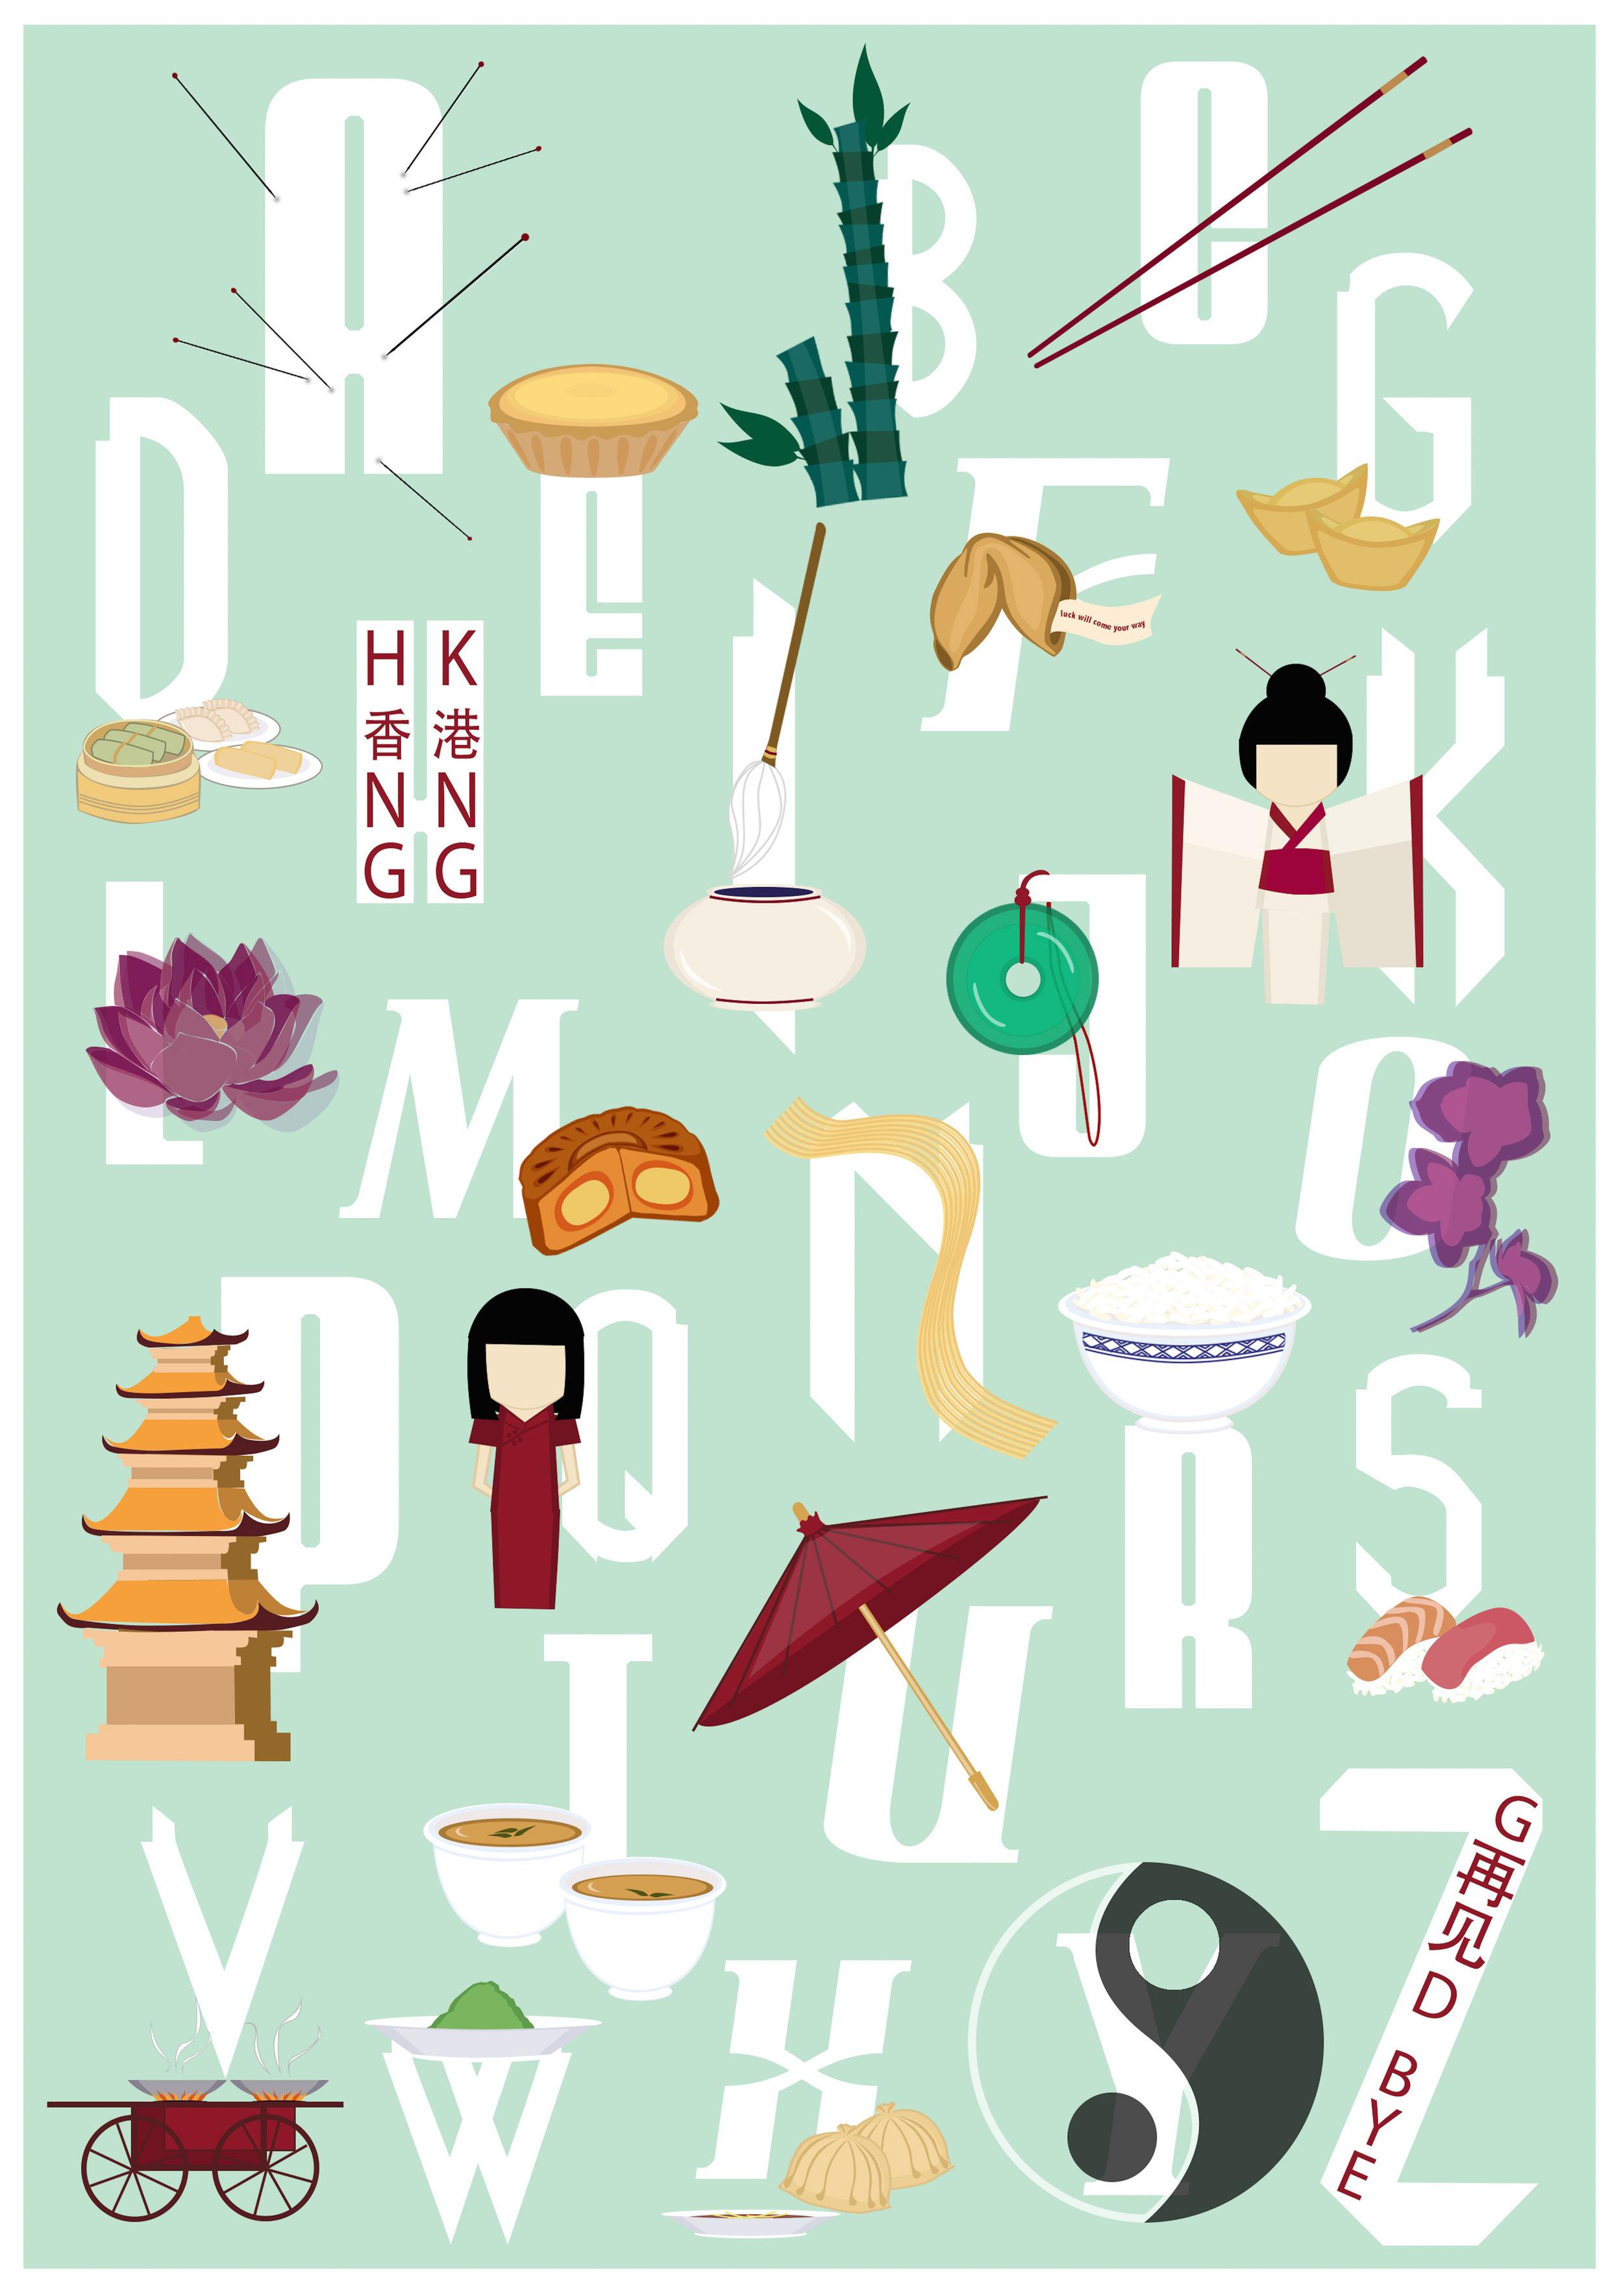 Asia's Alphabet – 2013